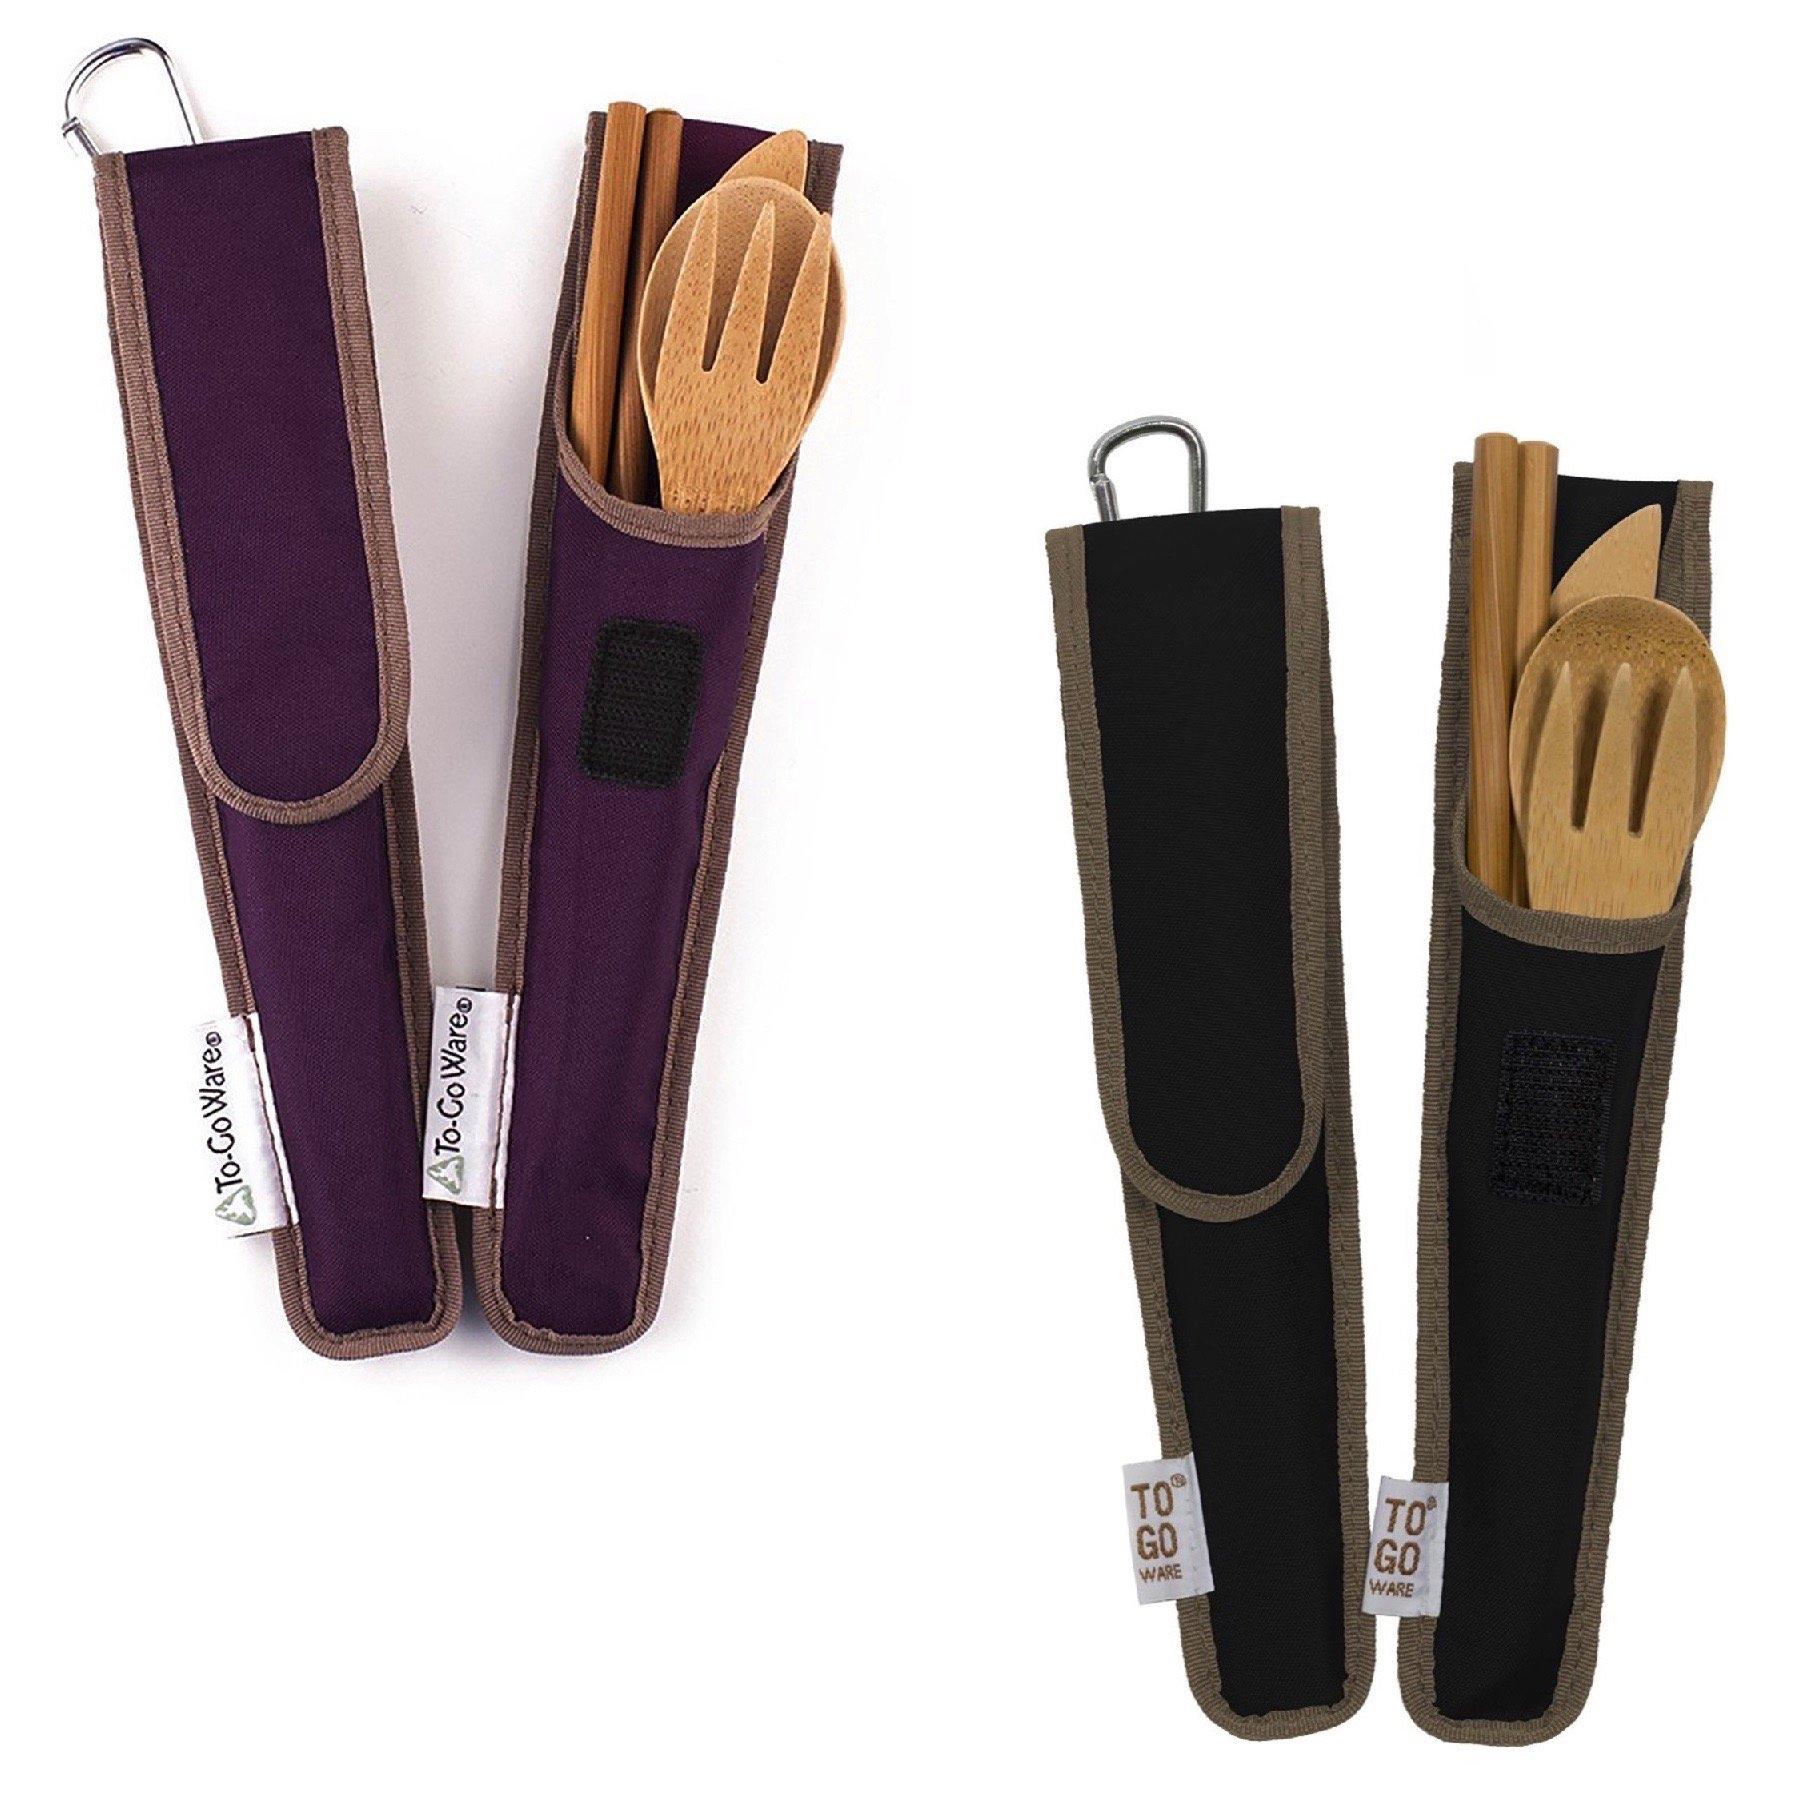 ChicoBag ToGoWare RePEaT Bamboo Utensil Set Hijiki Black+ Mulberry Purple Travel